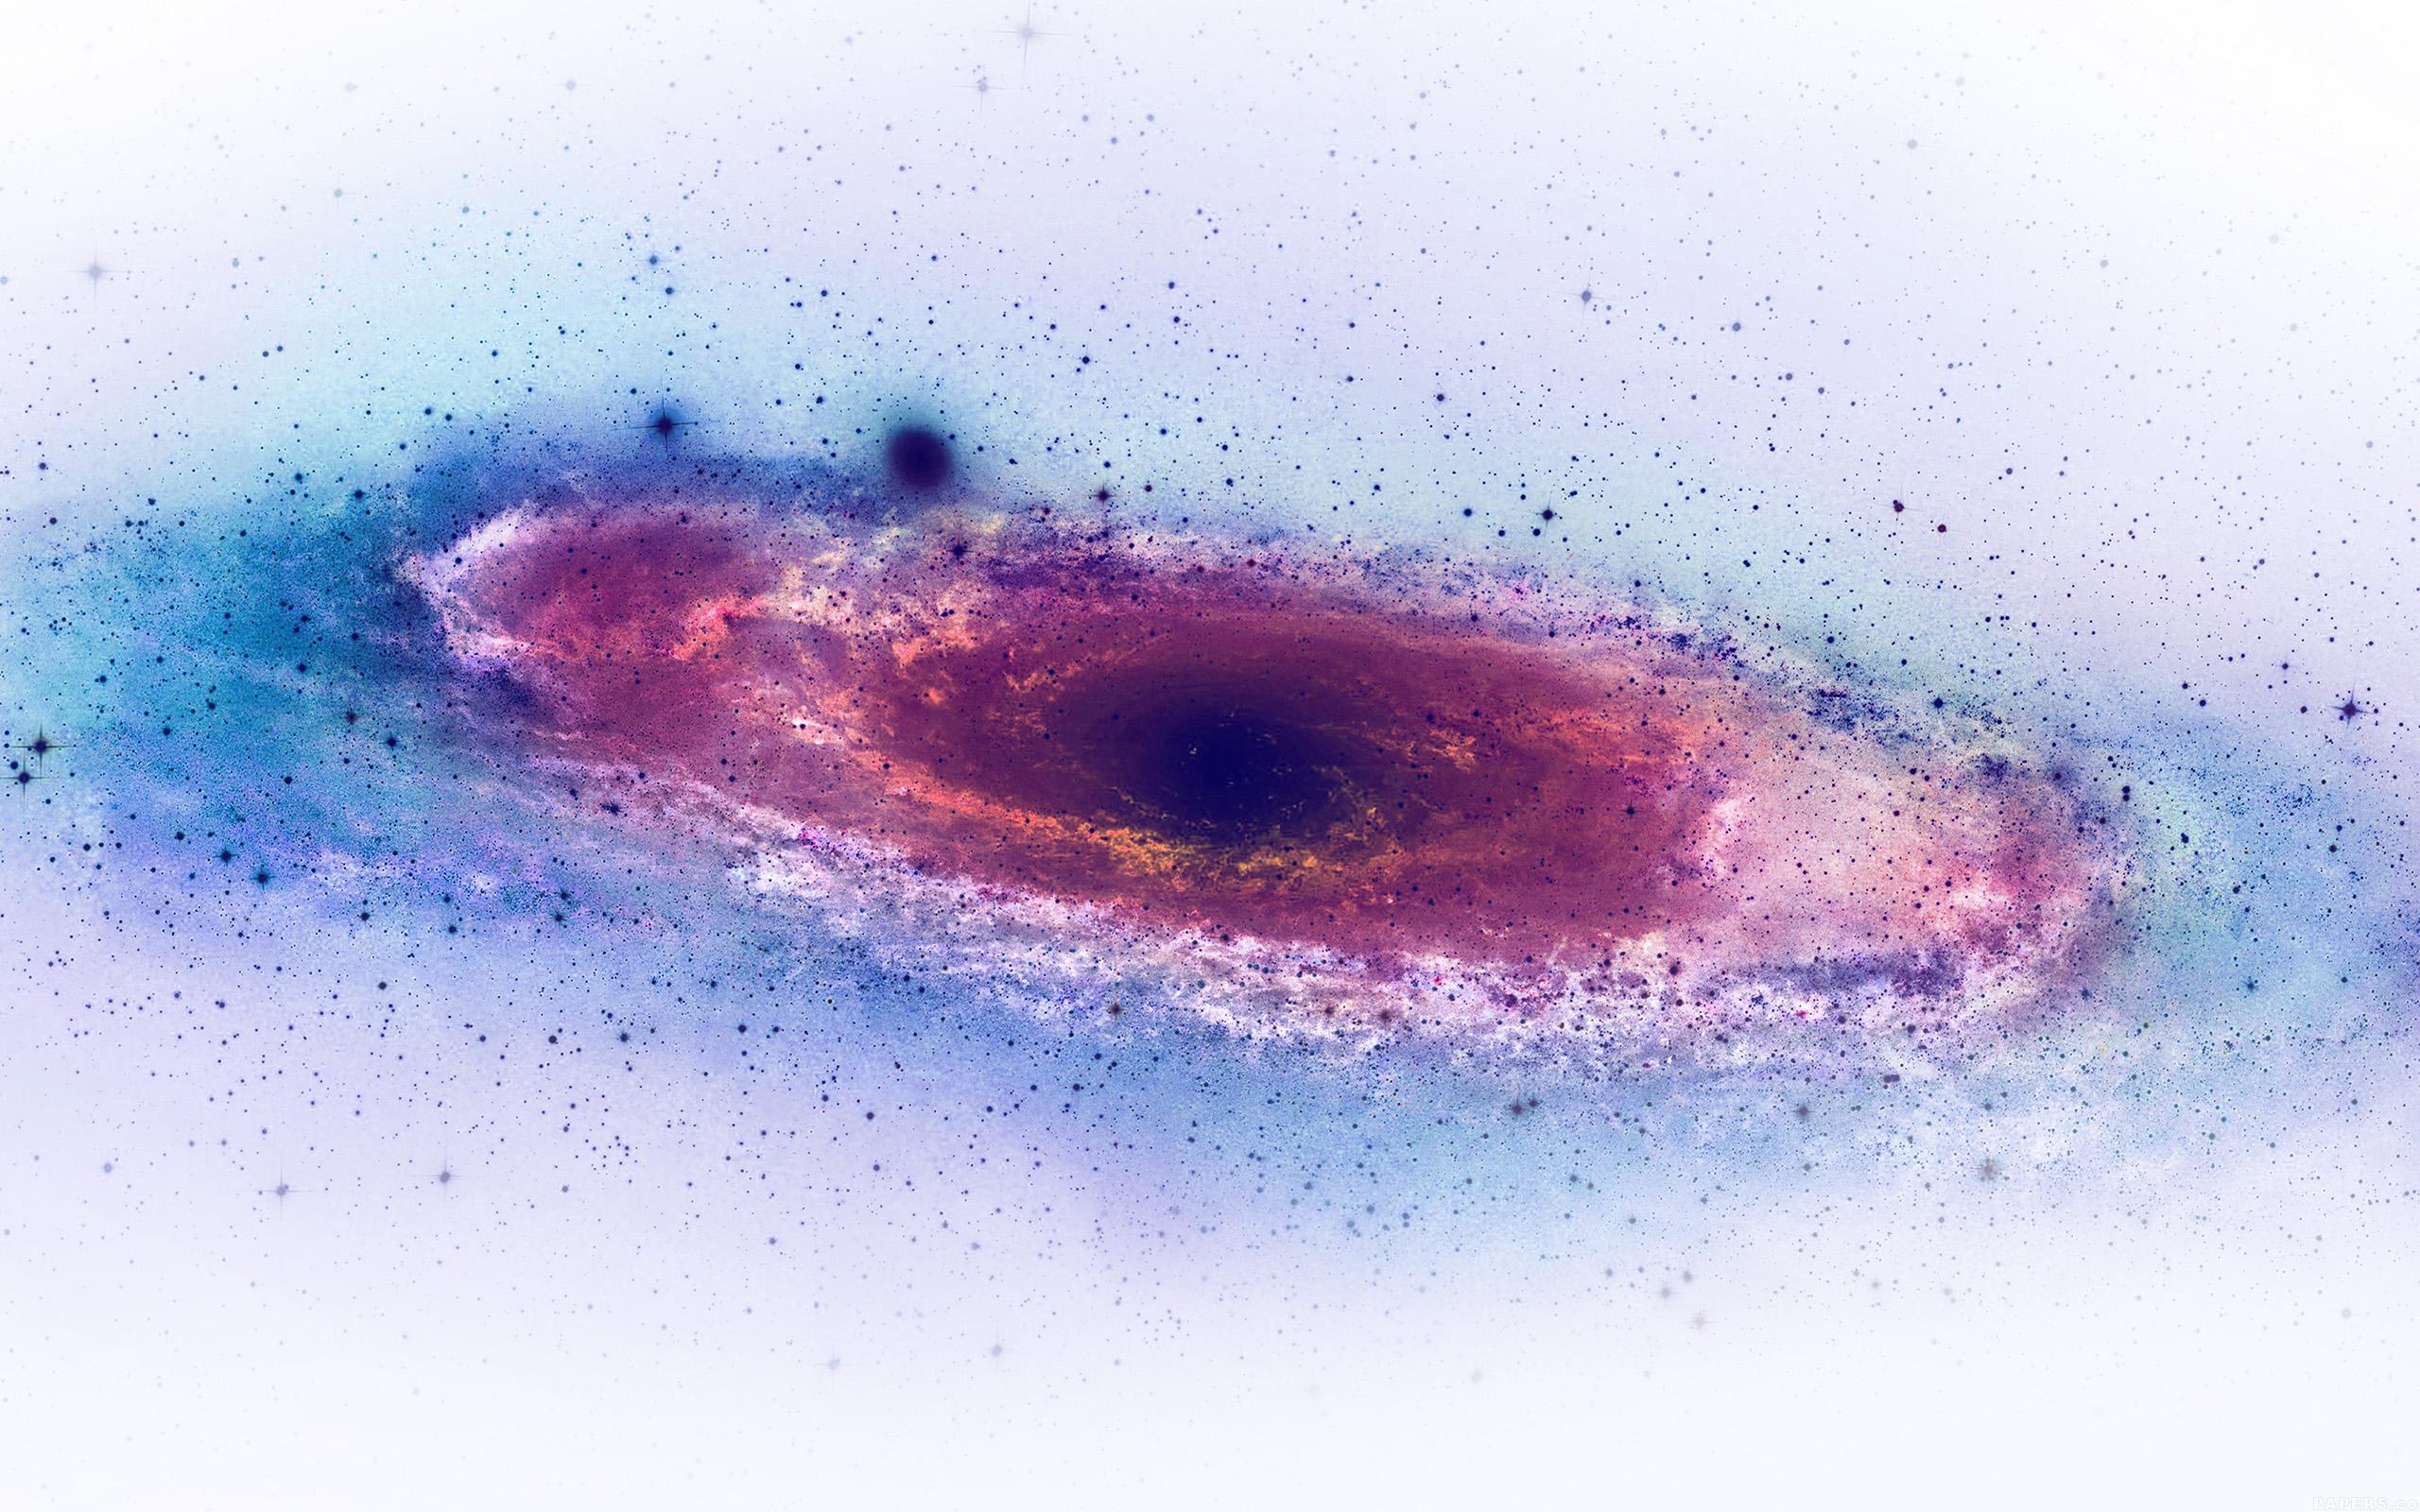 Ipad Retina Wallpapers Space: Mj77-galaxy-s-space-war-nature-art